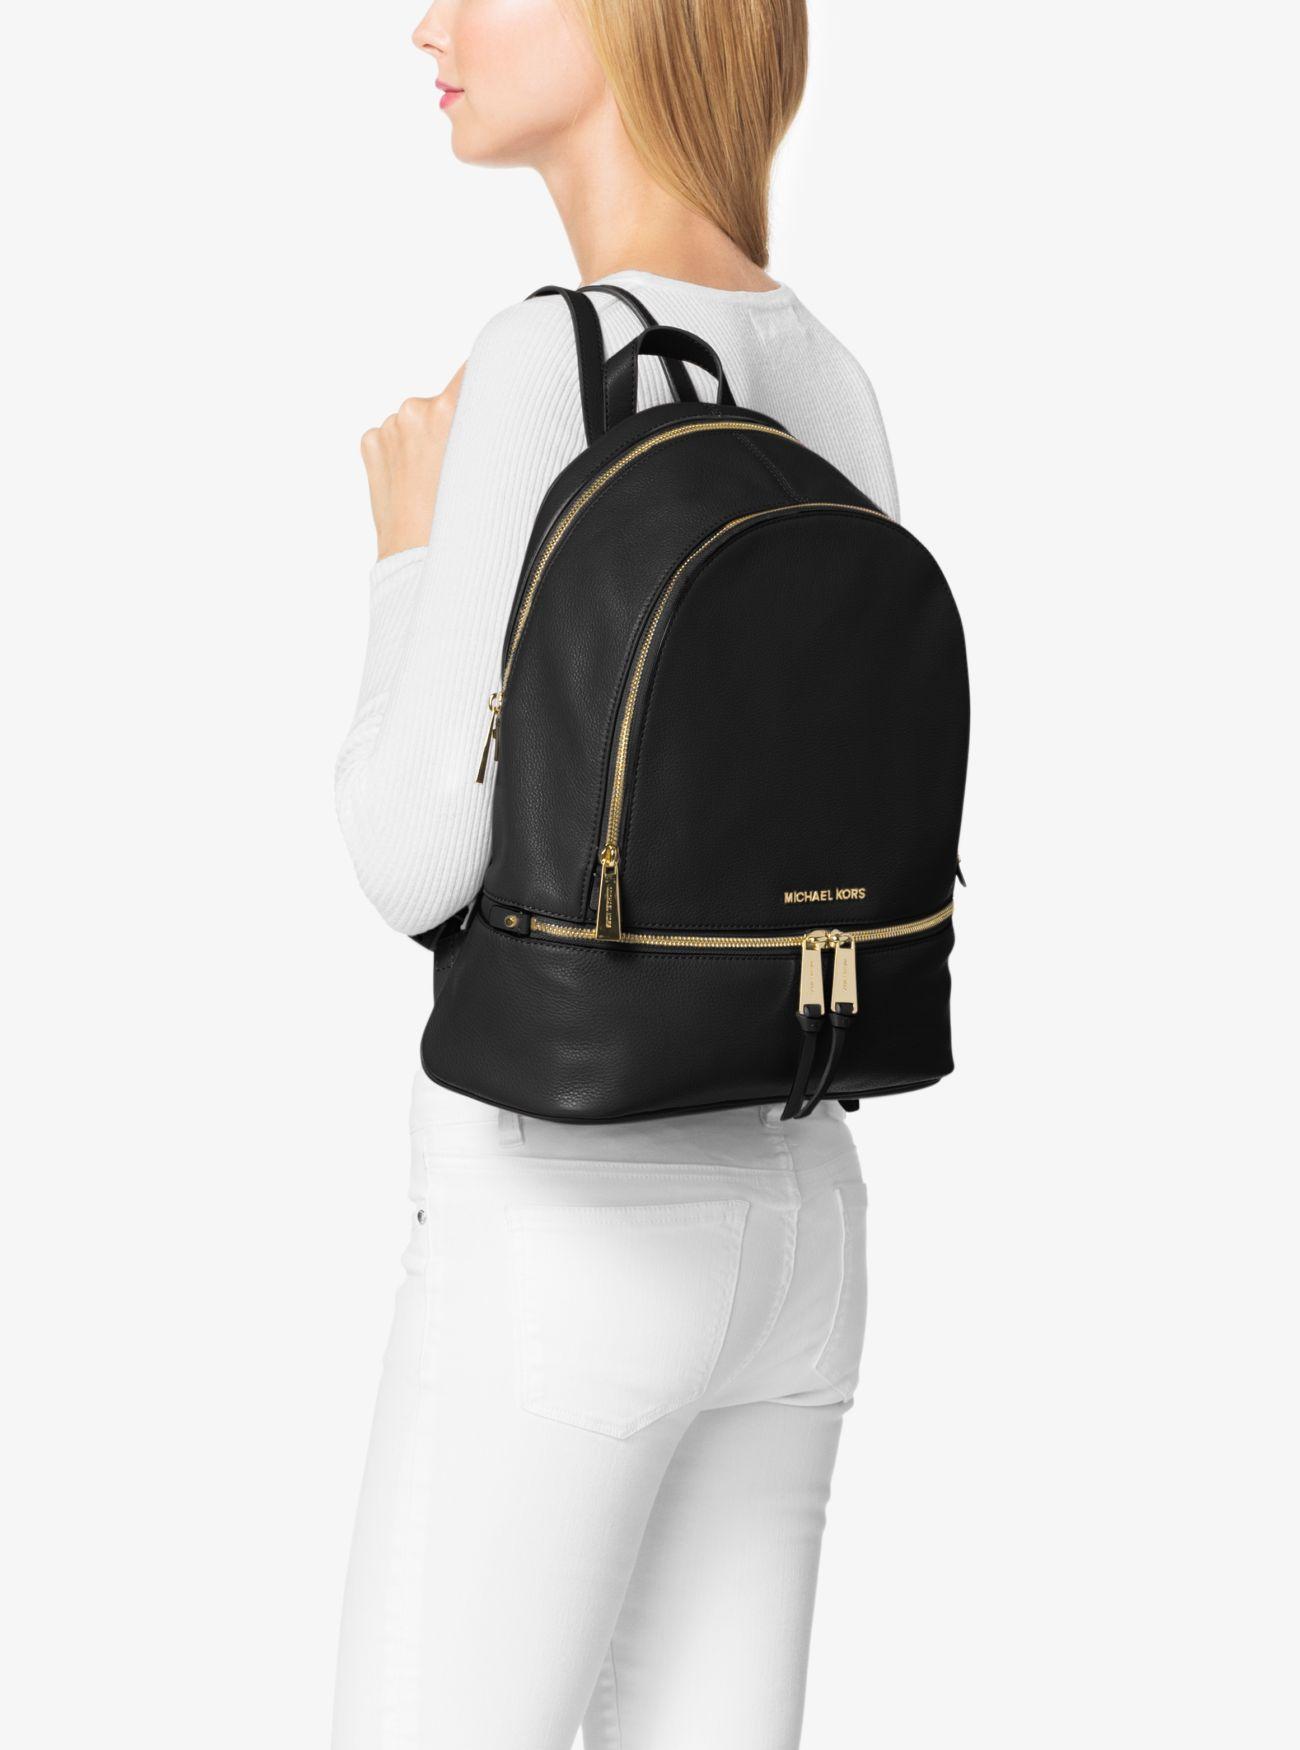 14f668c504d4 ... Rhea Large Leather Backpack Rhea Large Leather Backpack. MICHAEL  Michael Kors